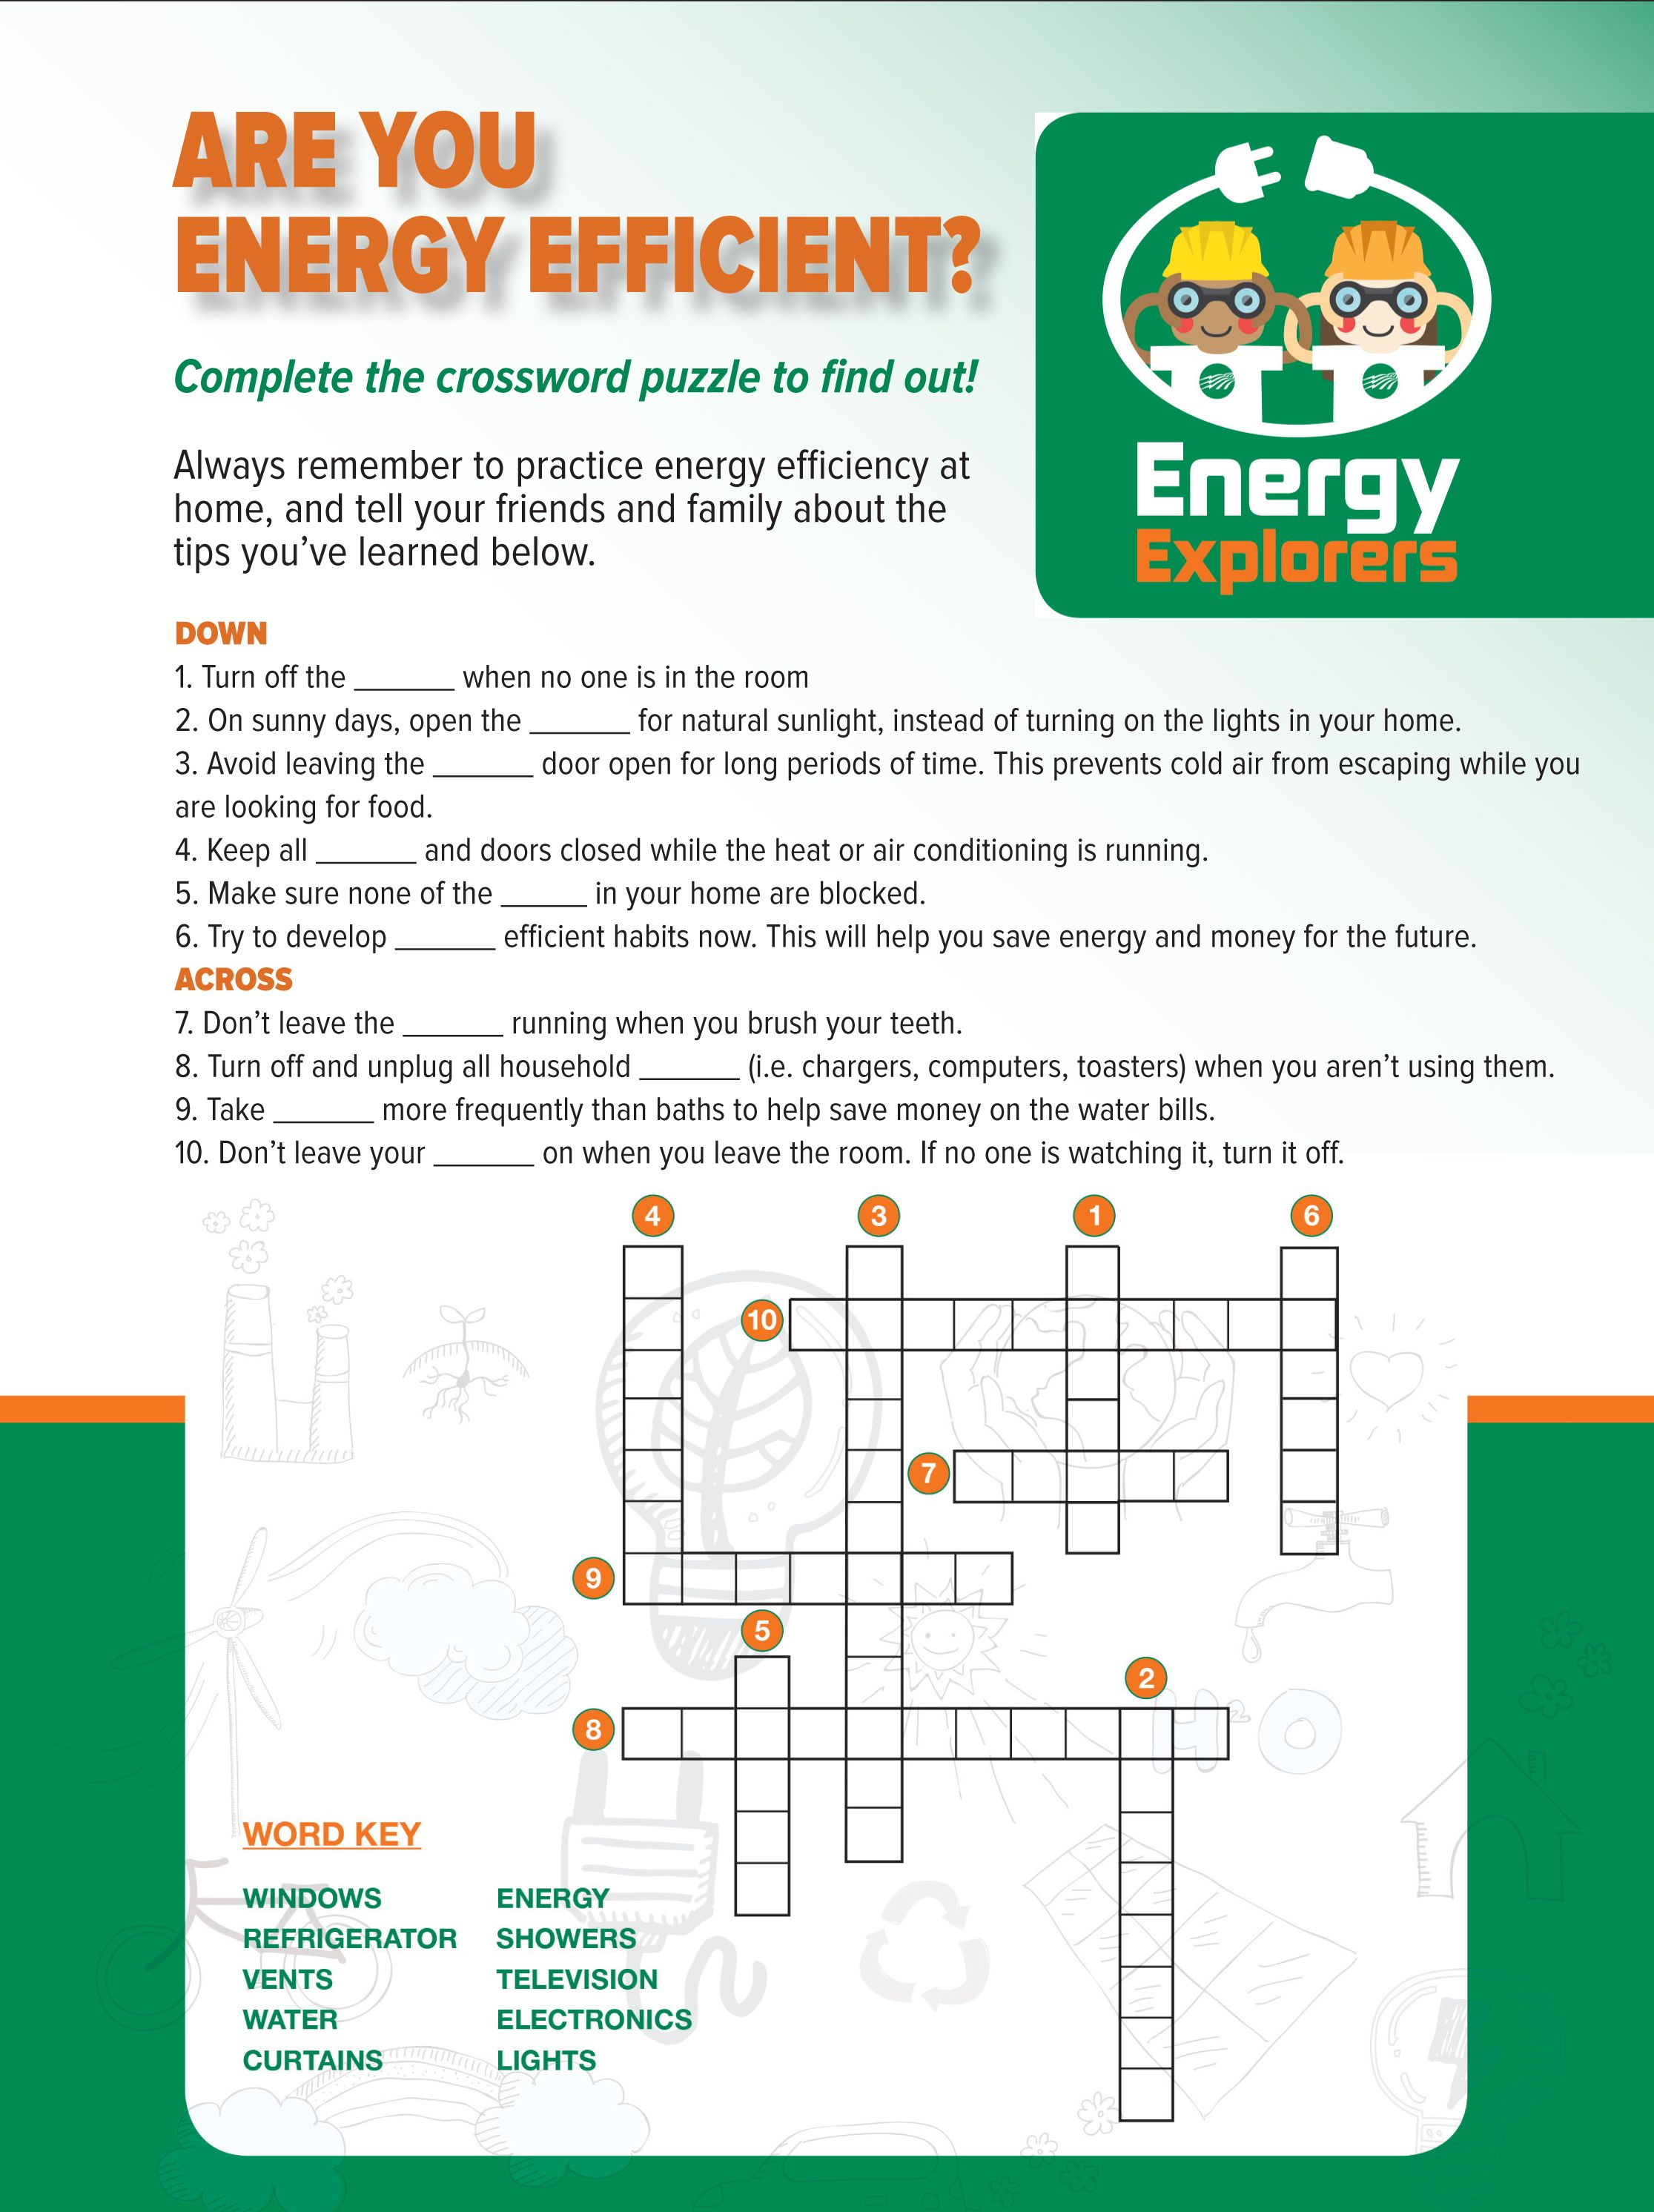 Green curtains crossword - Crossword Puzzle